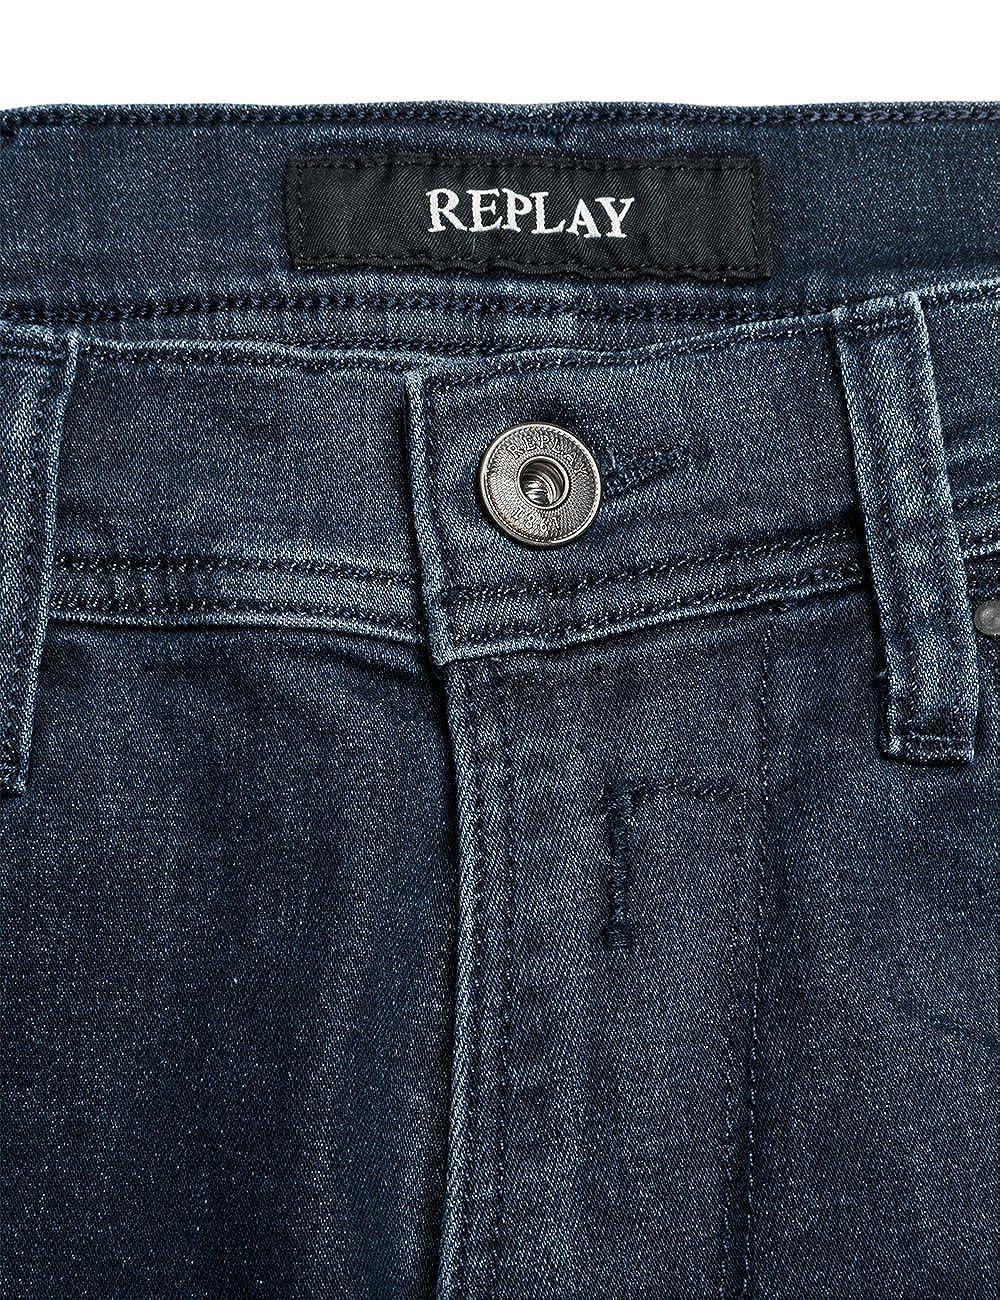 Replay Herren Herren Herren Skinny Jeans Jondrill B077K36N26 Accessoires Preiszugeständnisse 65da3e